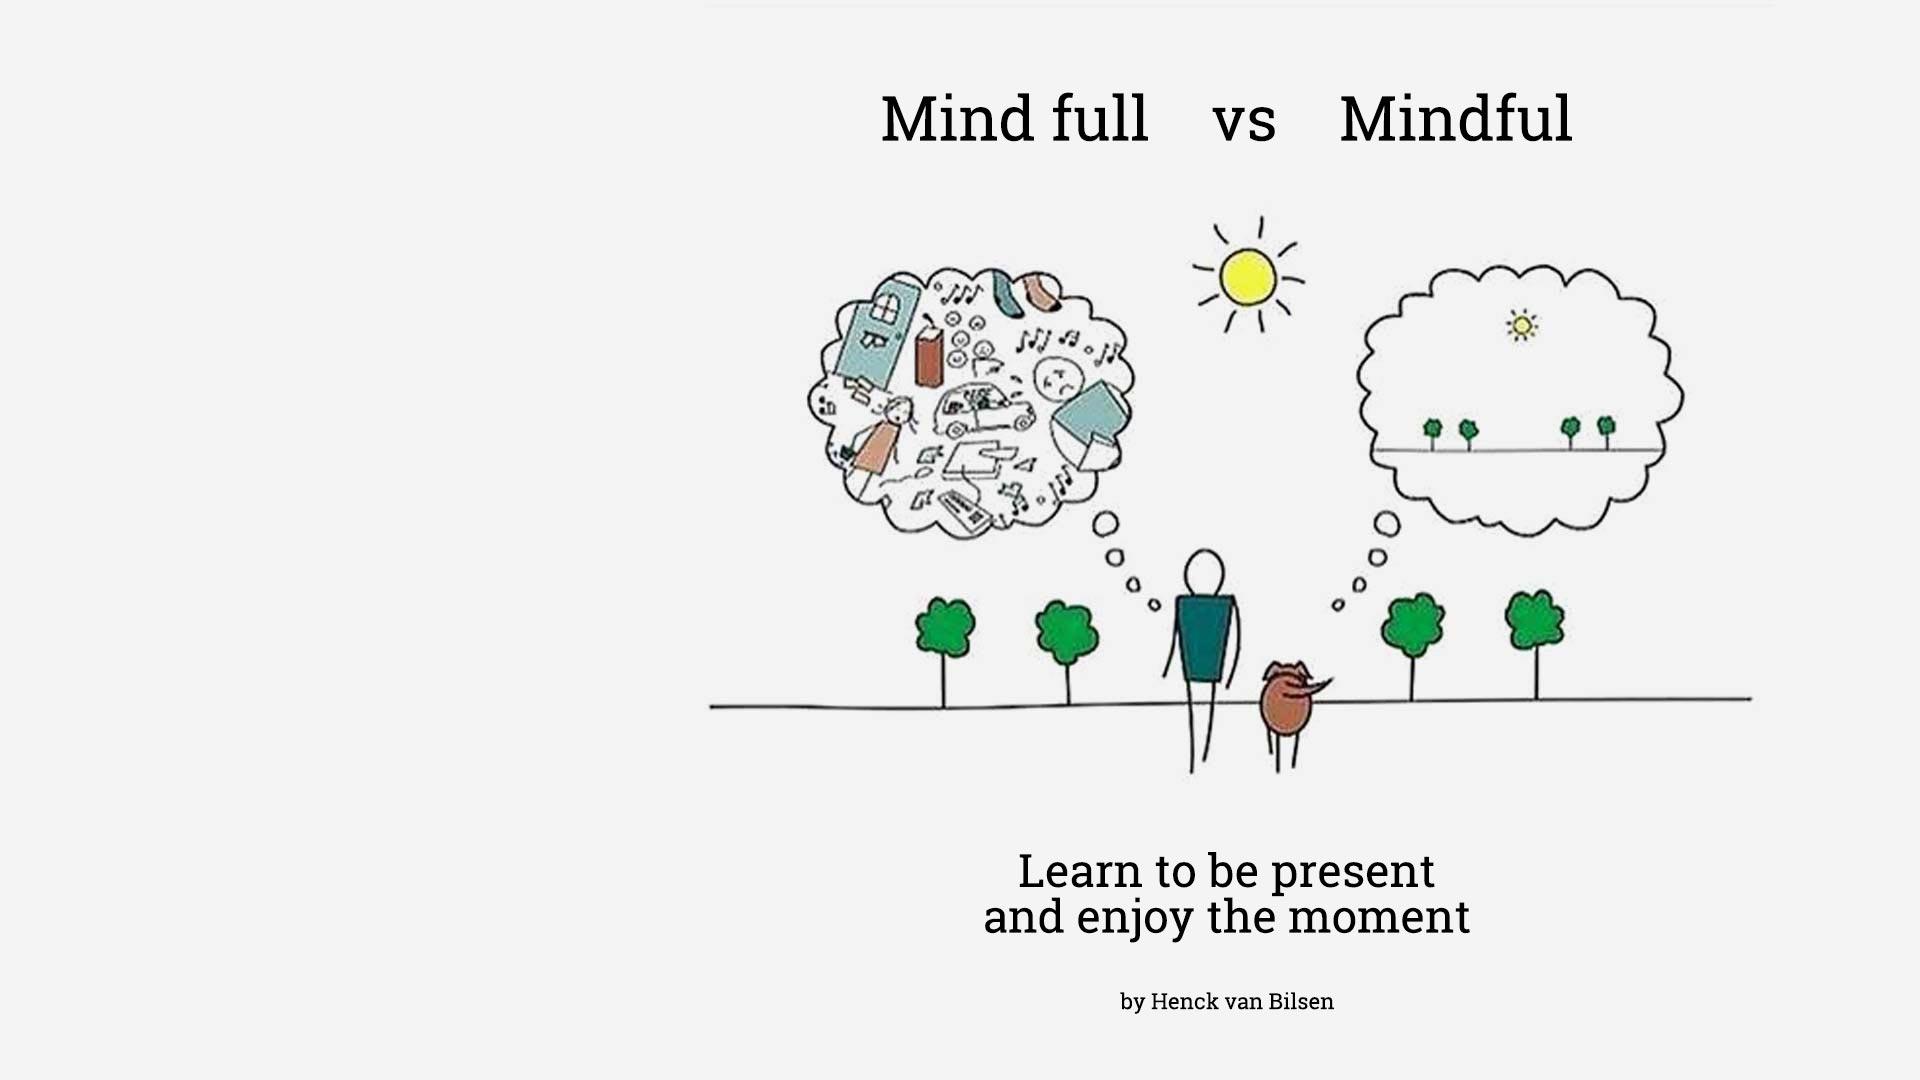 Bachmann Leadership Leistungen Gesundheit fördern Mindfulness